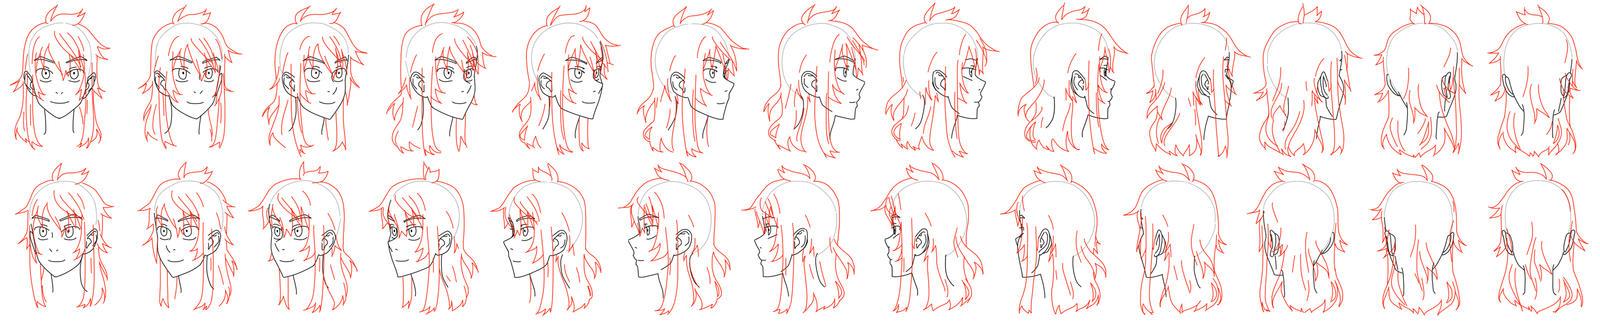 Head turnaround frames by Flipfloppery